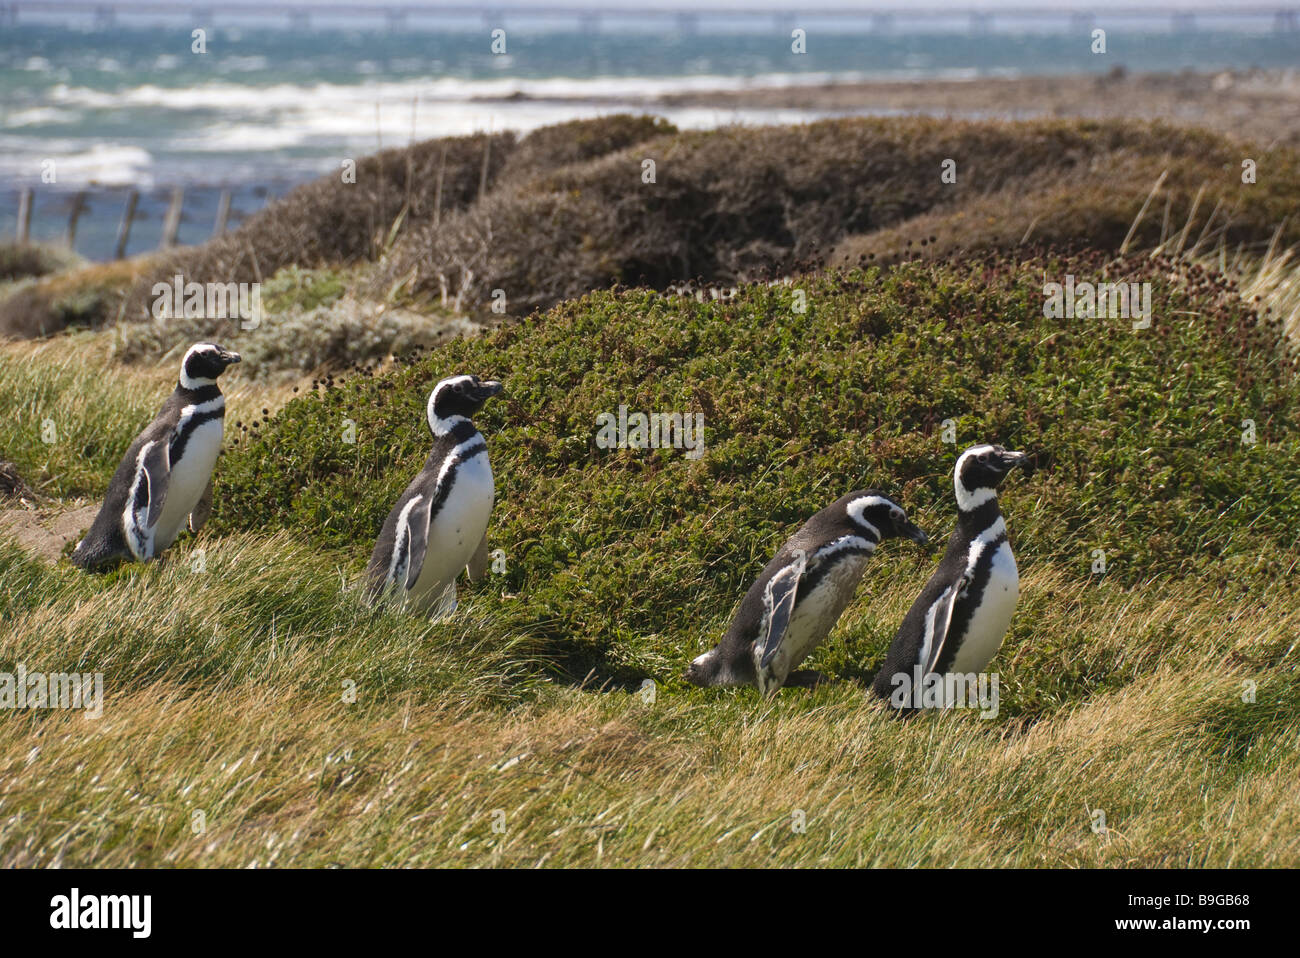 Elk198 4169 Chile Patagonia Seno Otway Reserva Pingüino pingüinos de Magallanes Spheniscus magallanicus Imagen De Stock